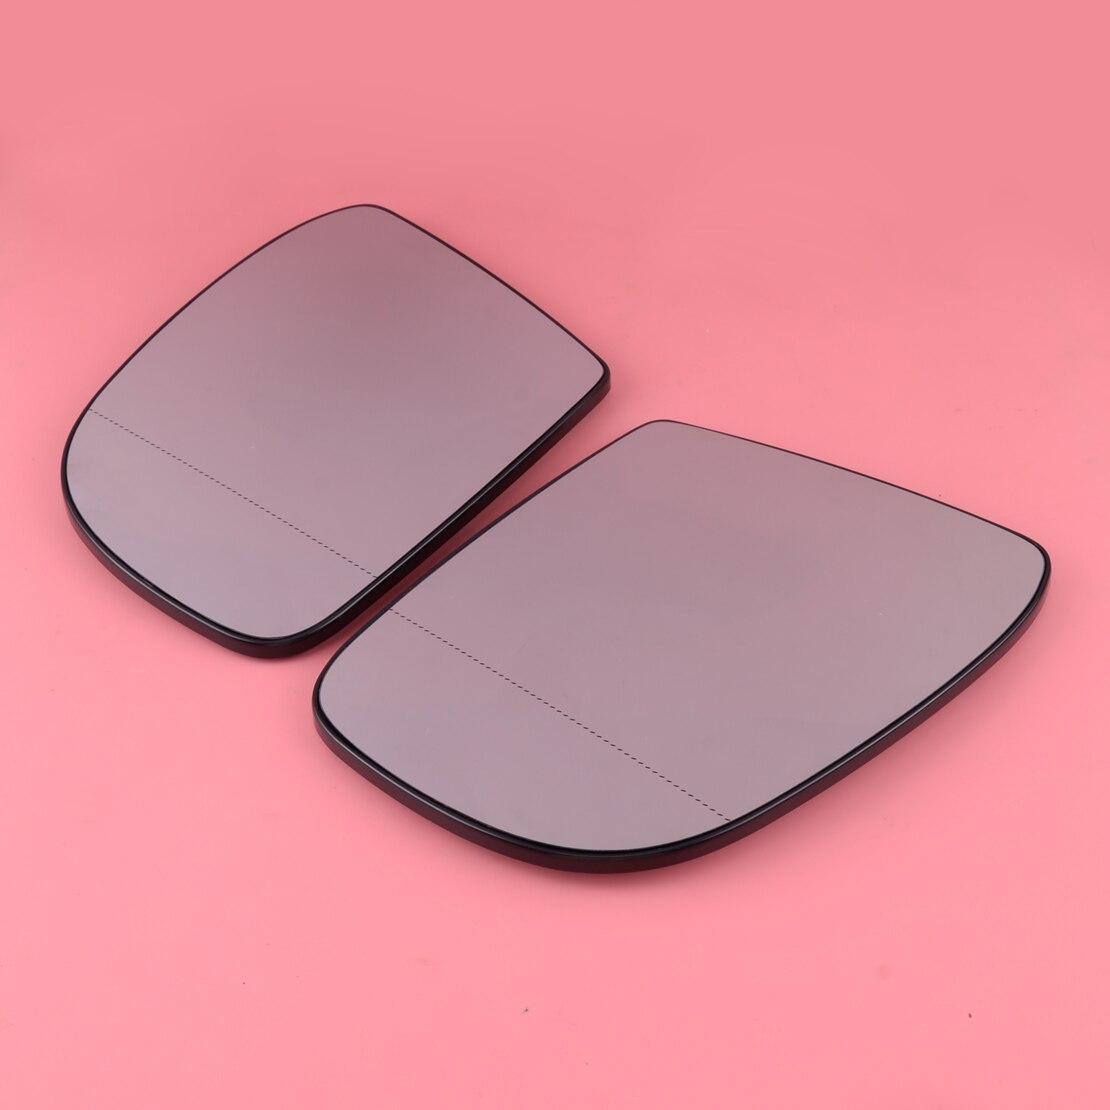 1 Pair Car Door Mirror Glass Heated 1648100719 1648100819 Fit for Mercedes Benz W164 W251 GL320 GL450 ML320 ML350 2007 2008